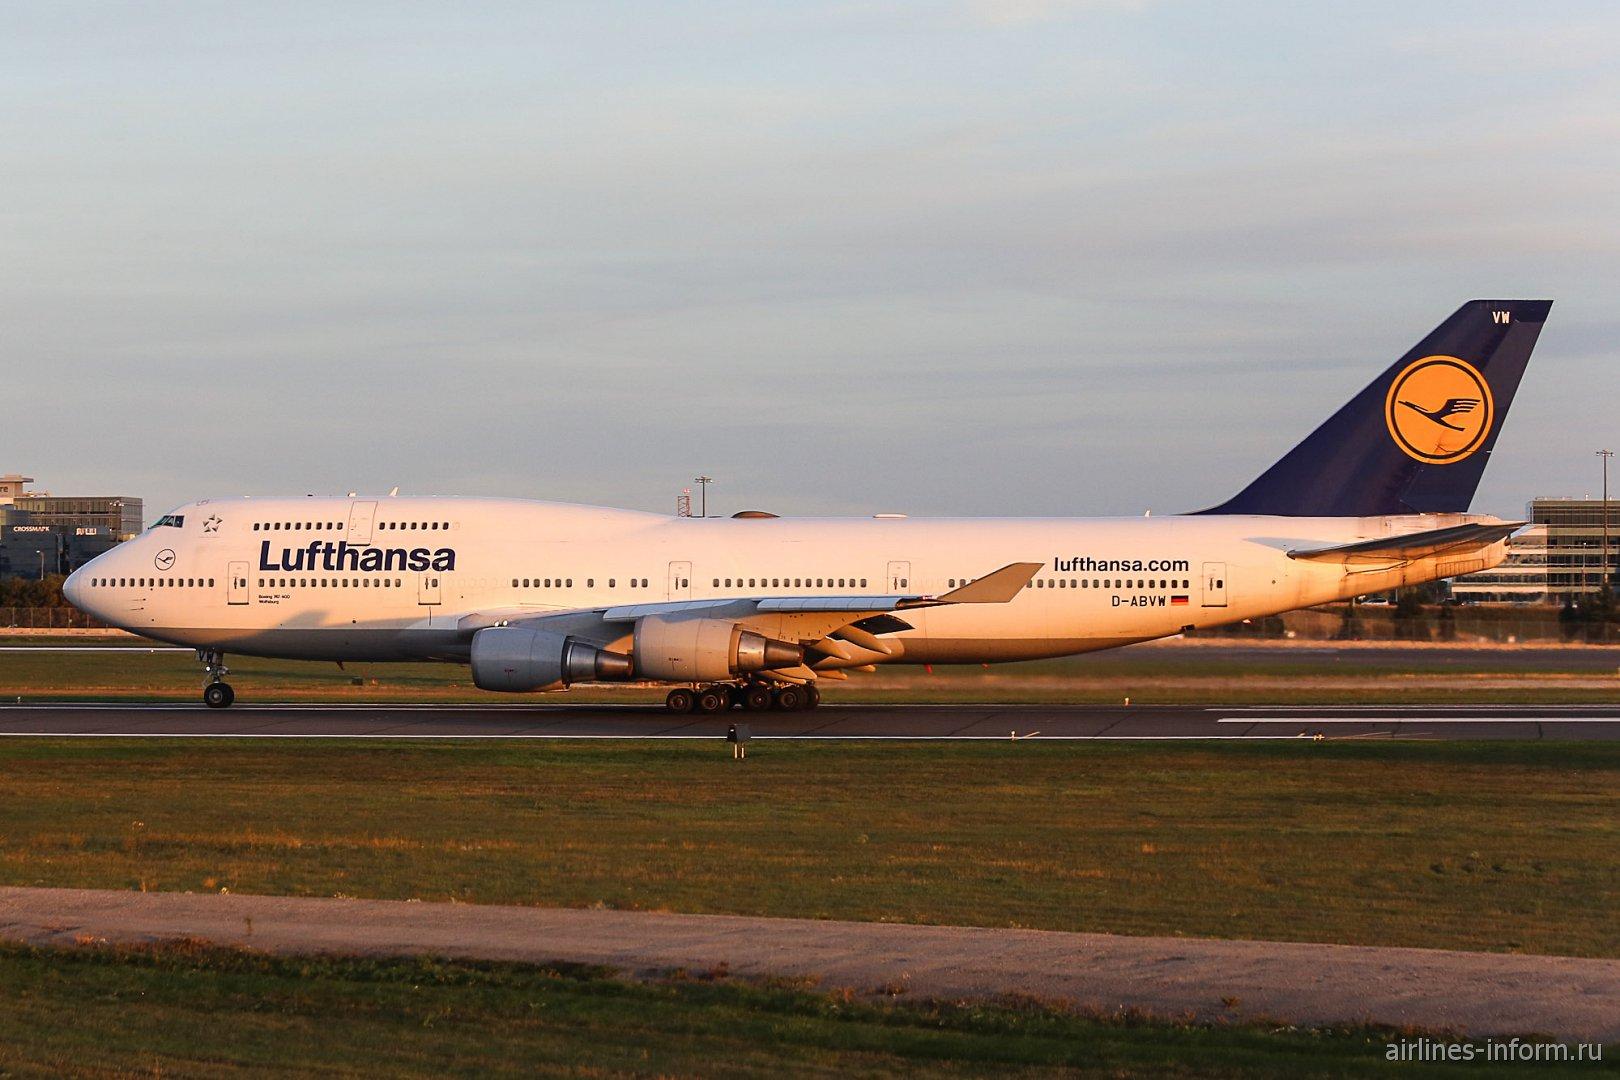 Boeing 747-400 D-ABVW авиакомпании Lufthansa в аэропорту Торонто Пирсон